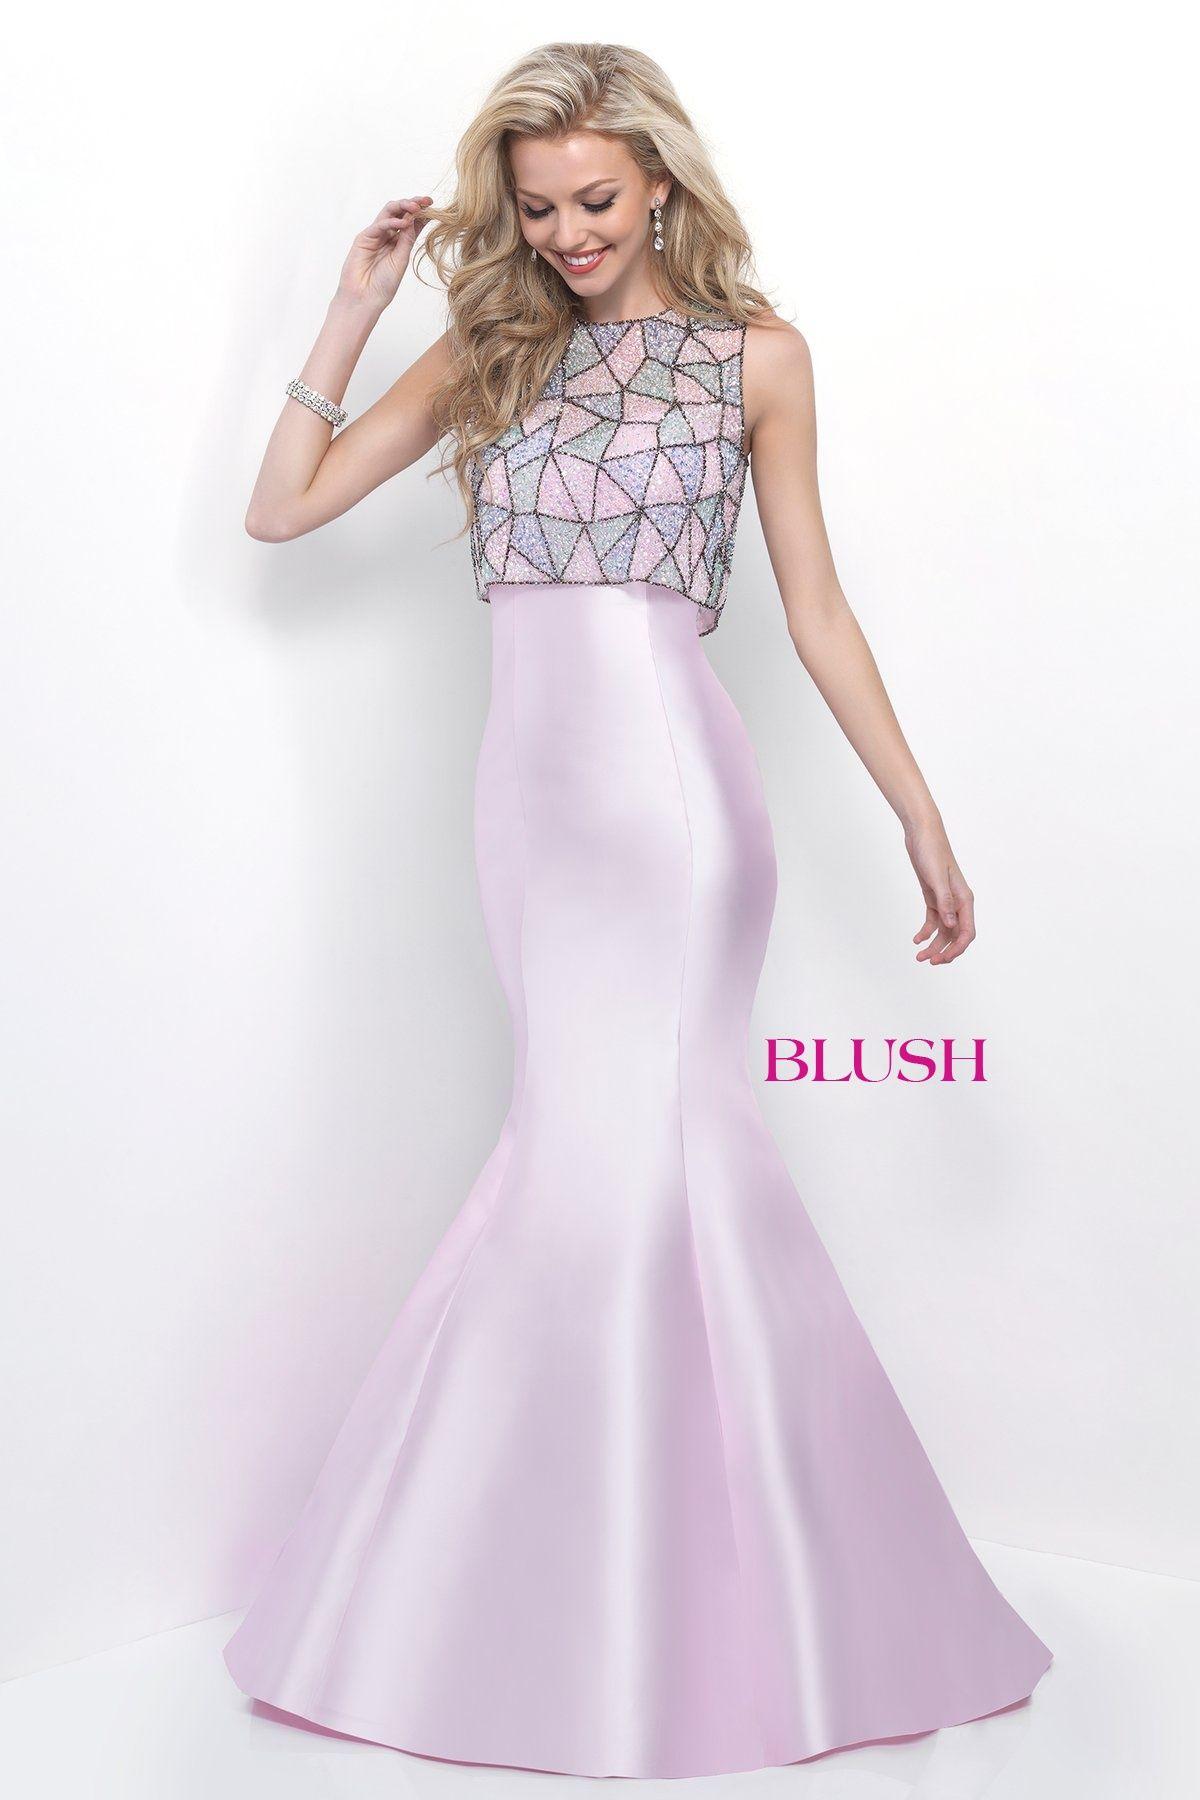 blush prom dresses style 11203 style 11203 QHBHYNY